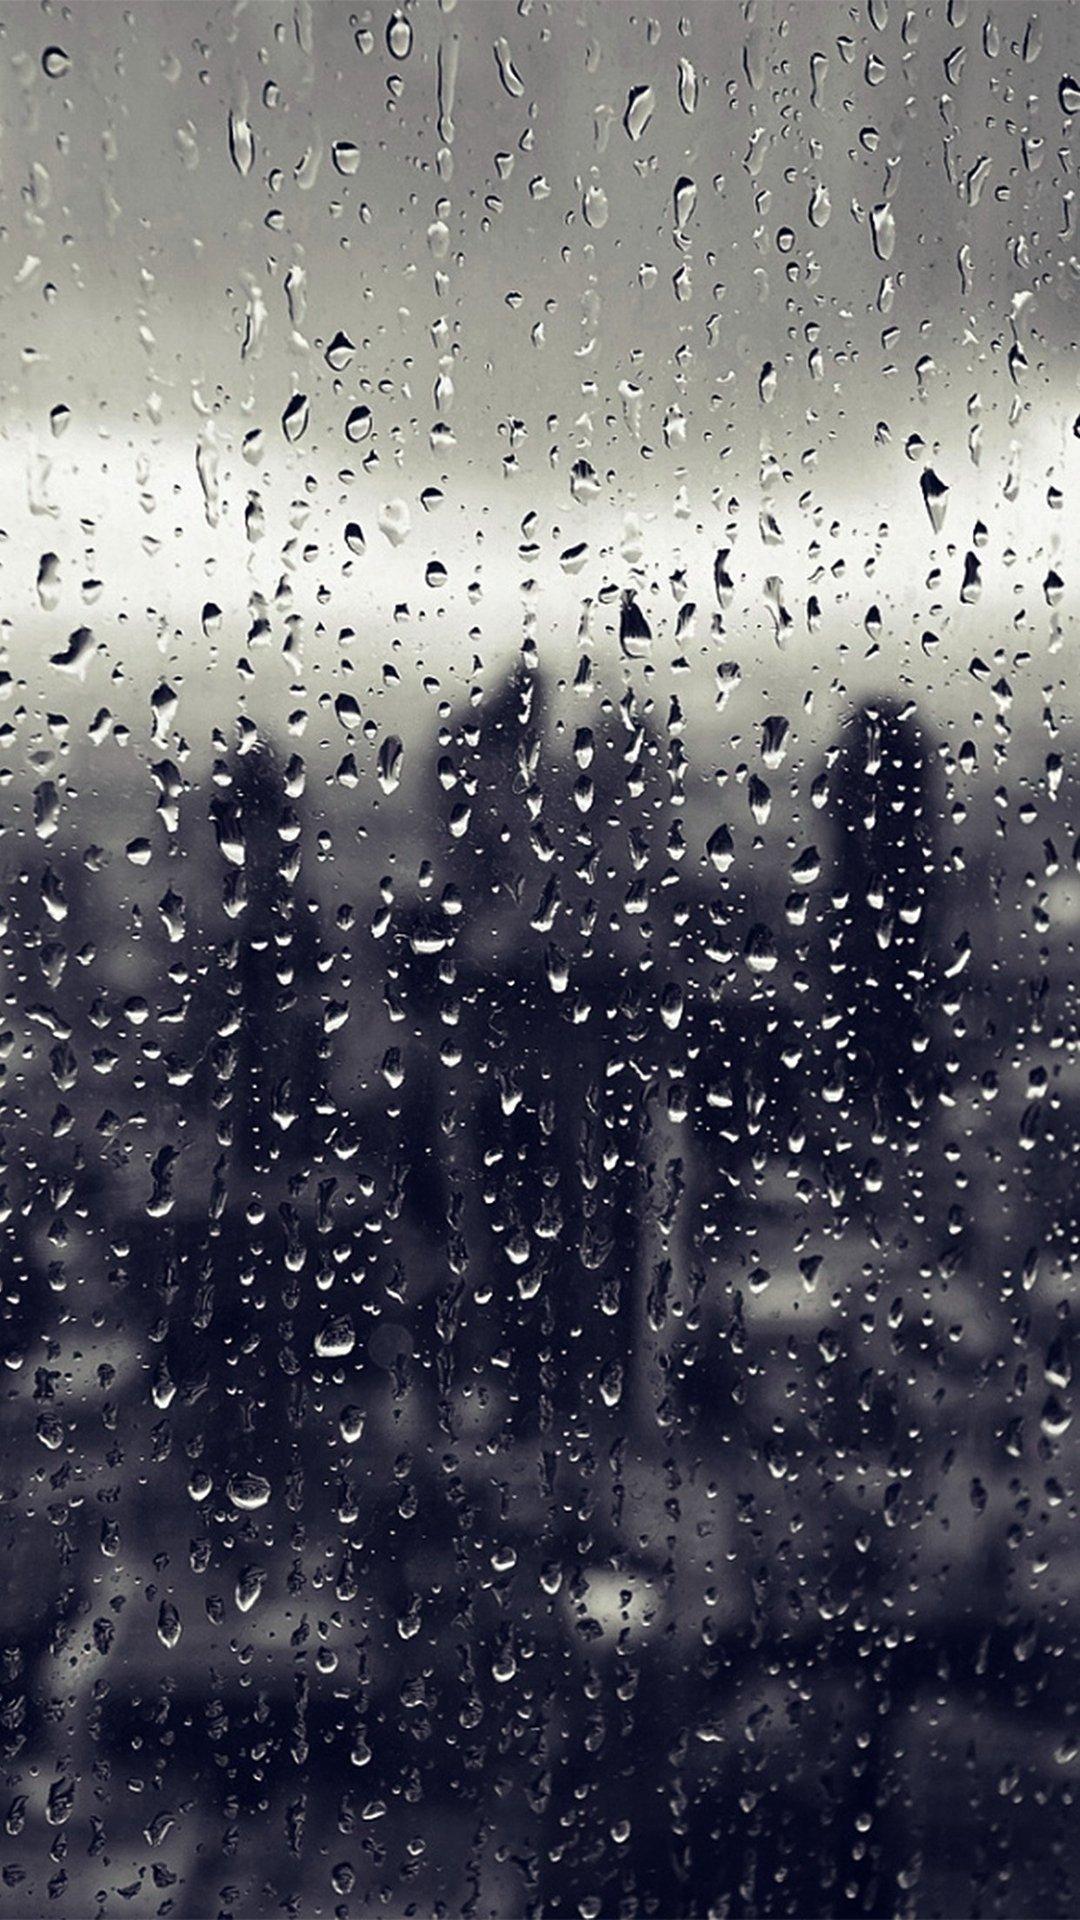 Rain iPhone 6 wallpaper tumblr